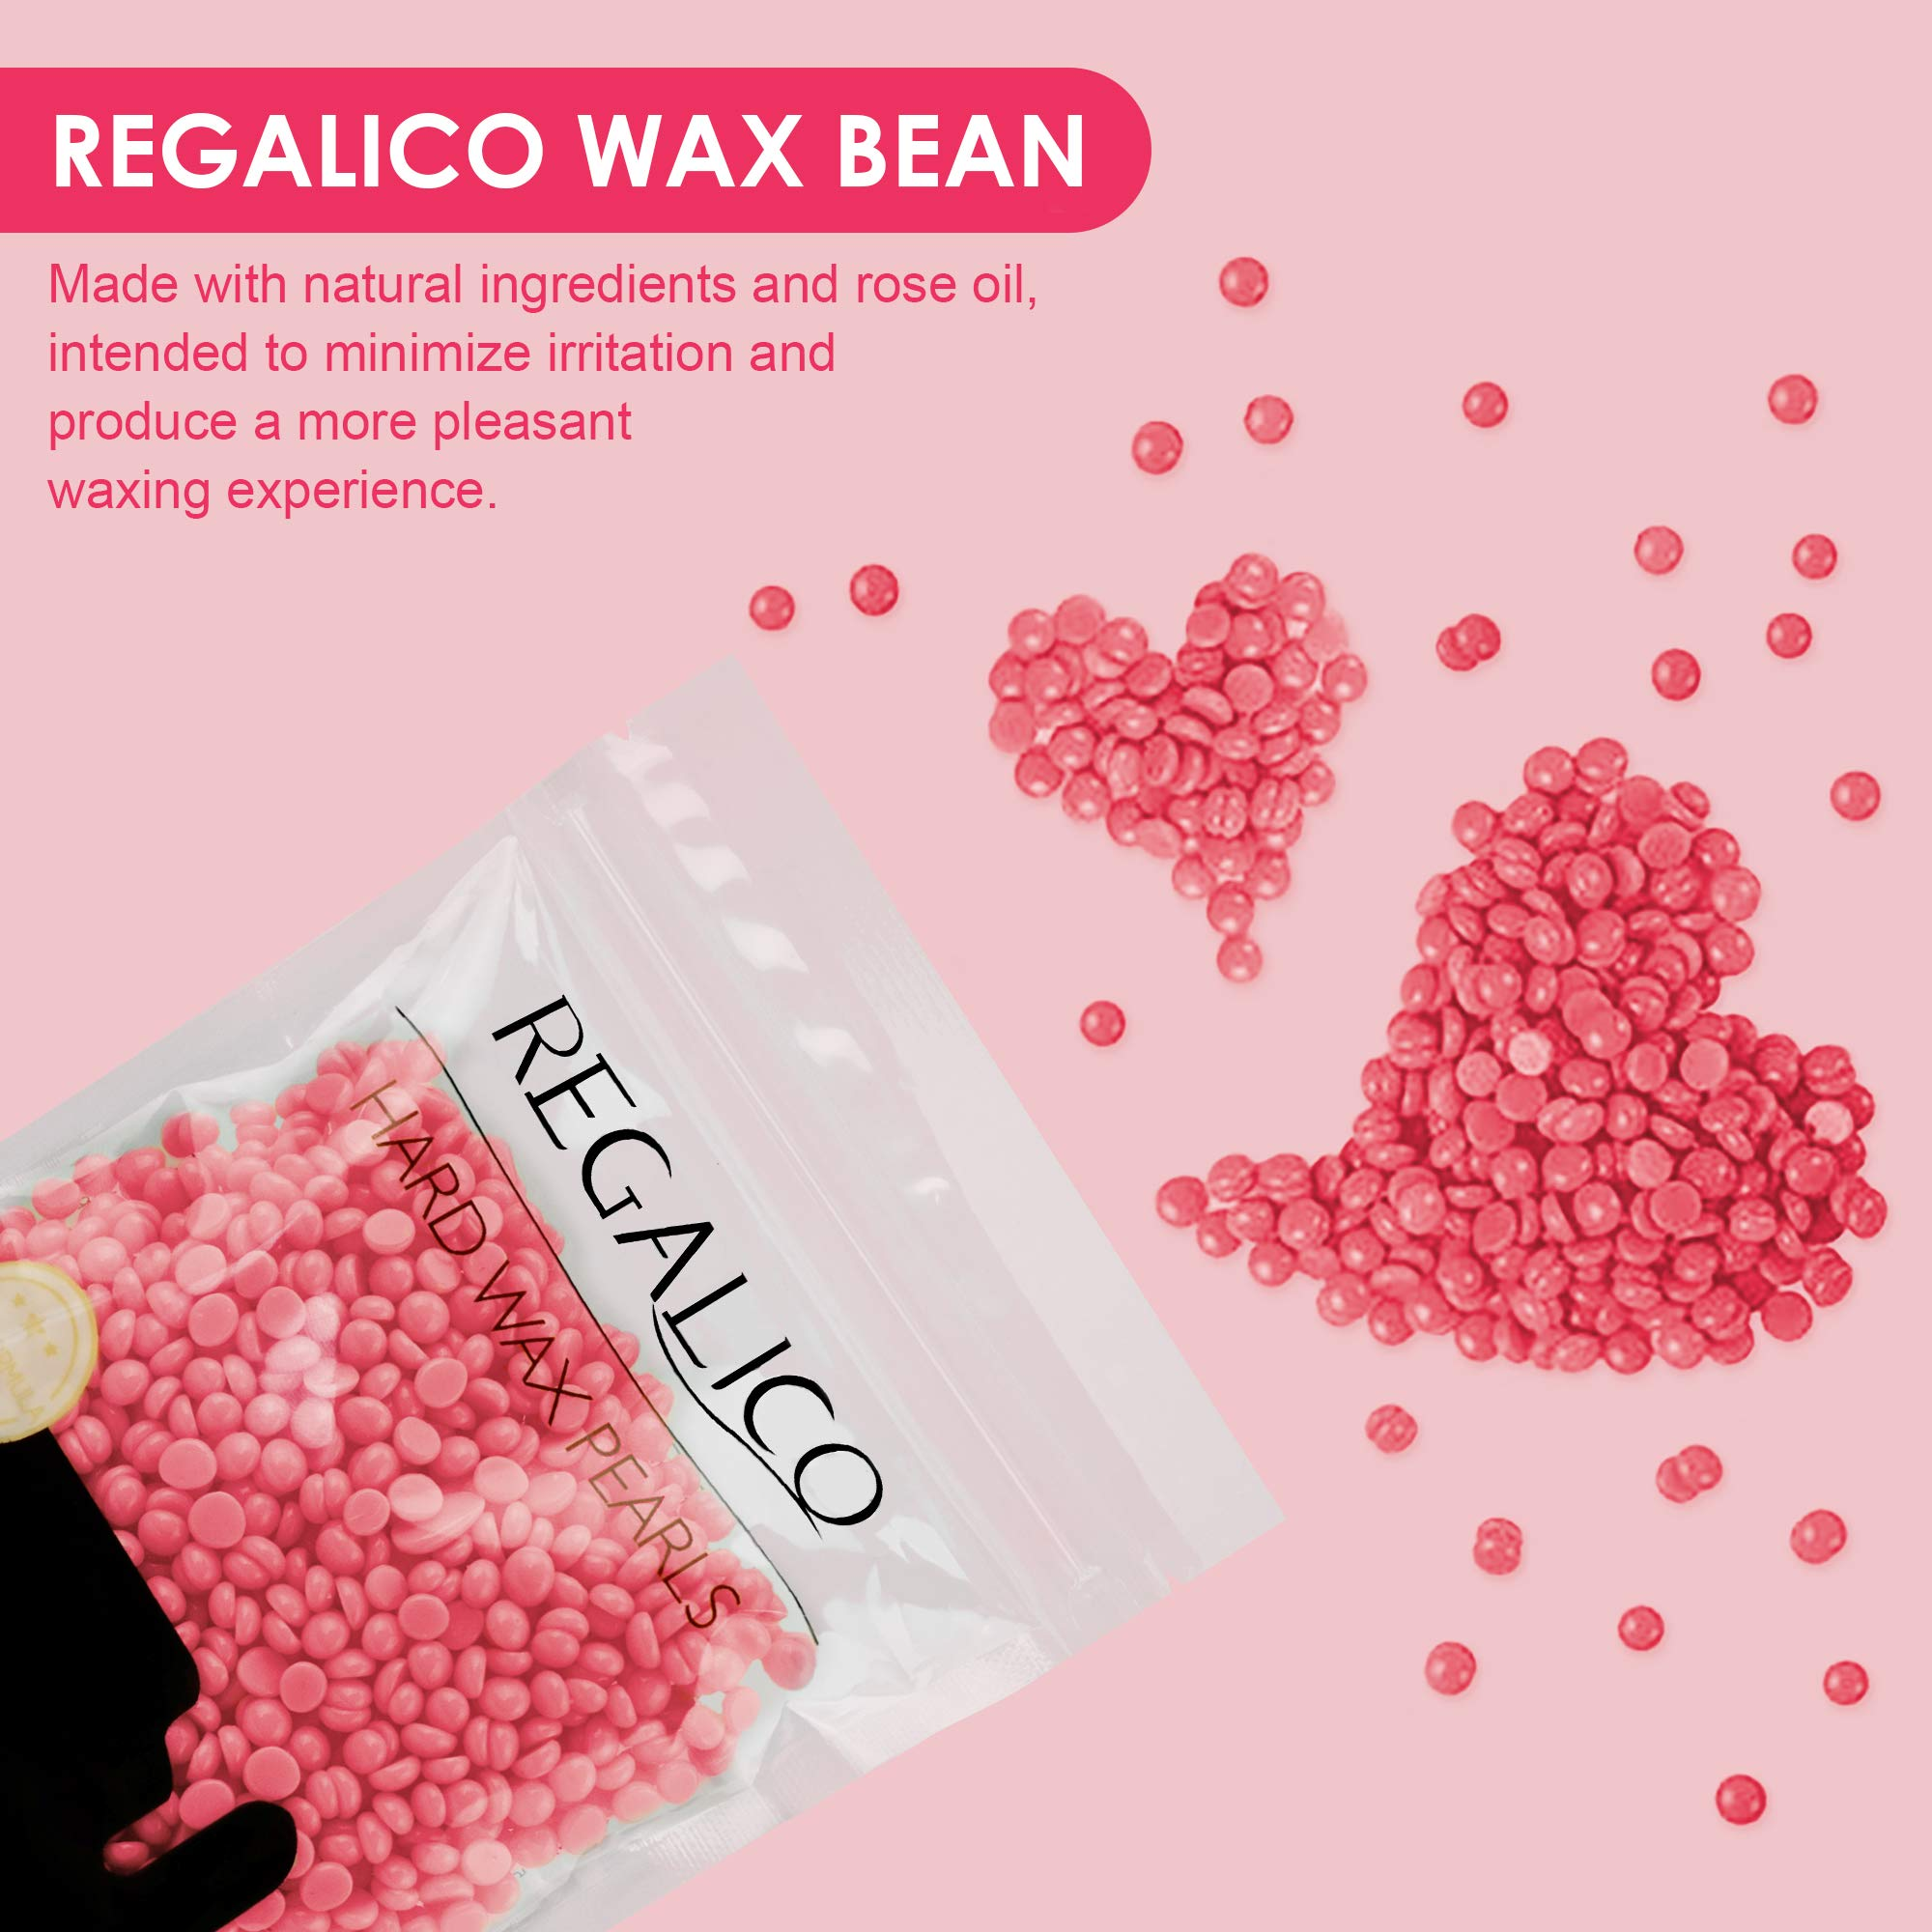 Waxing Kit for Women, Regalico Wax Warmer with 4 Bags Painless Hard Wax Beans Hair Removal Kit (3.5oz/Bag) 20 Wax Applicator Sticks, At Home Waxing Kit for Eyebrow,Armpit, Bikini, Brazilian